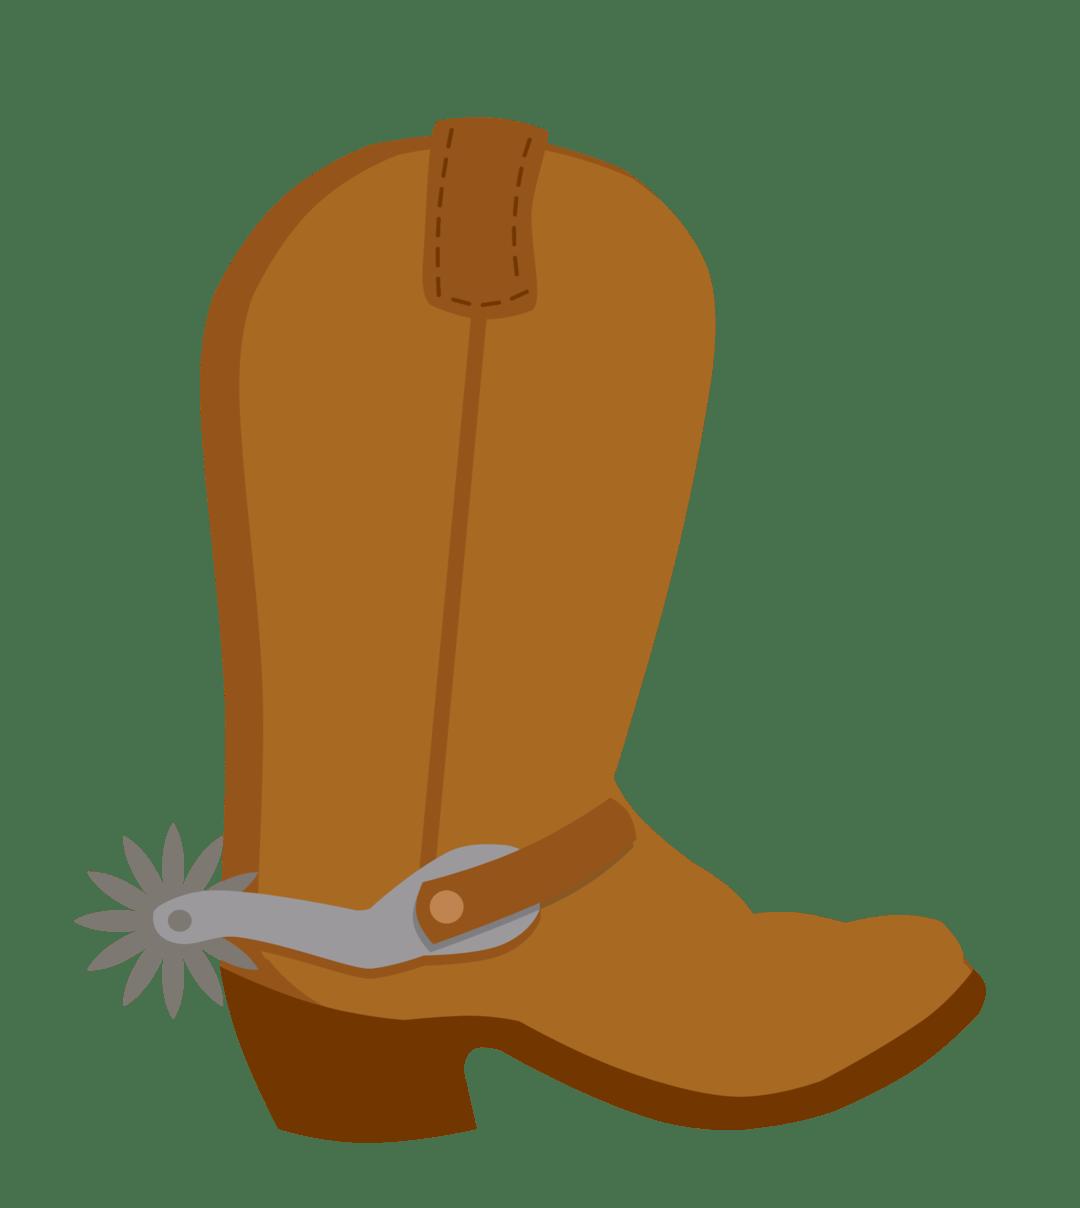 hight resolution of cowboy boot botawboy wboy boot untry western velho oeste clipart